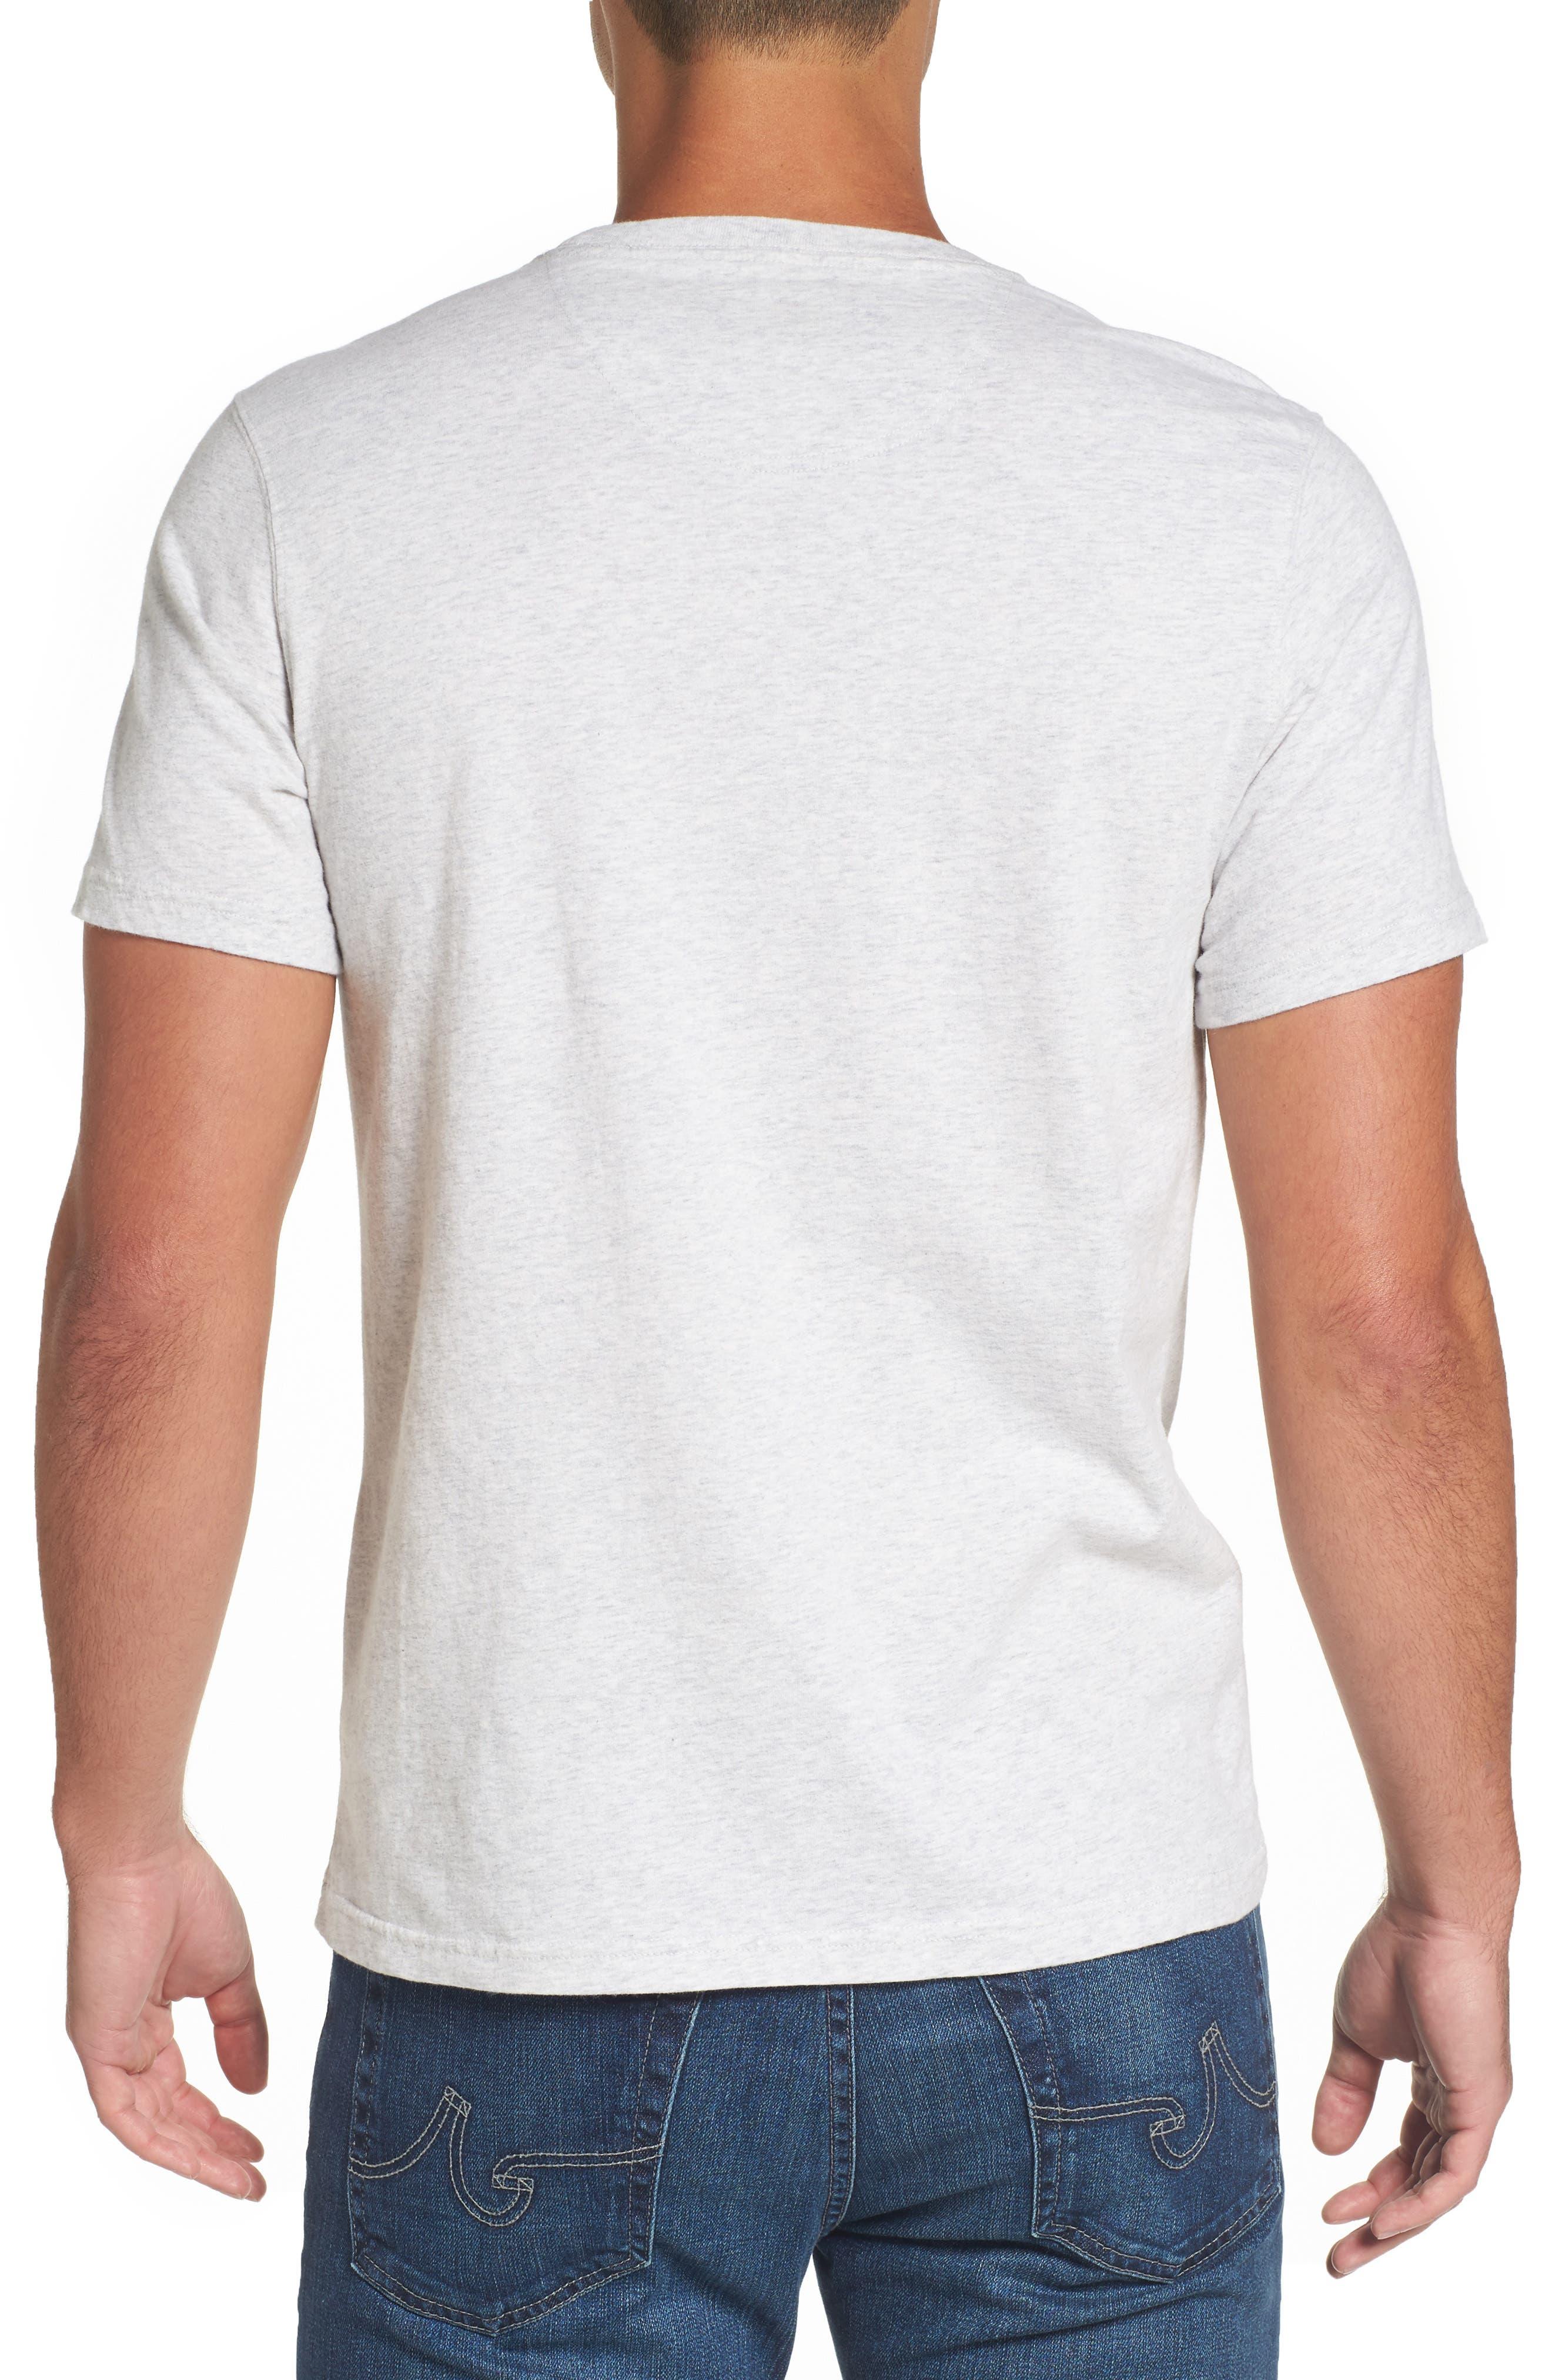 Cove Slim Fit Logo Graphic T-Shirt,                             Alternate thumbnail 2, color,                             260